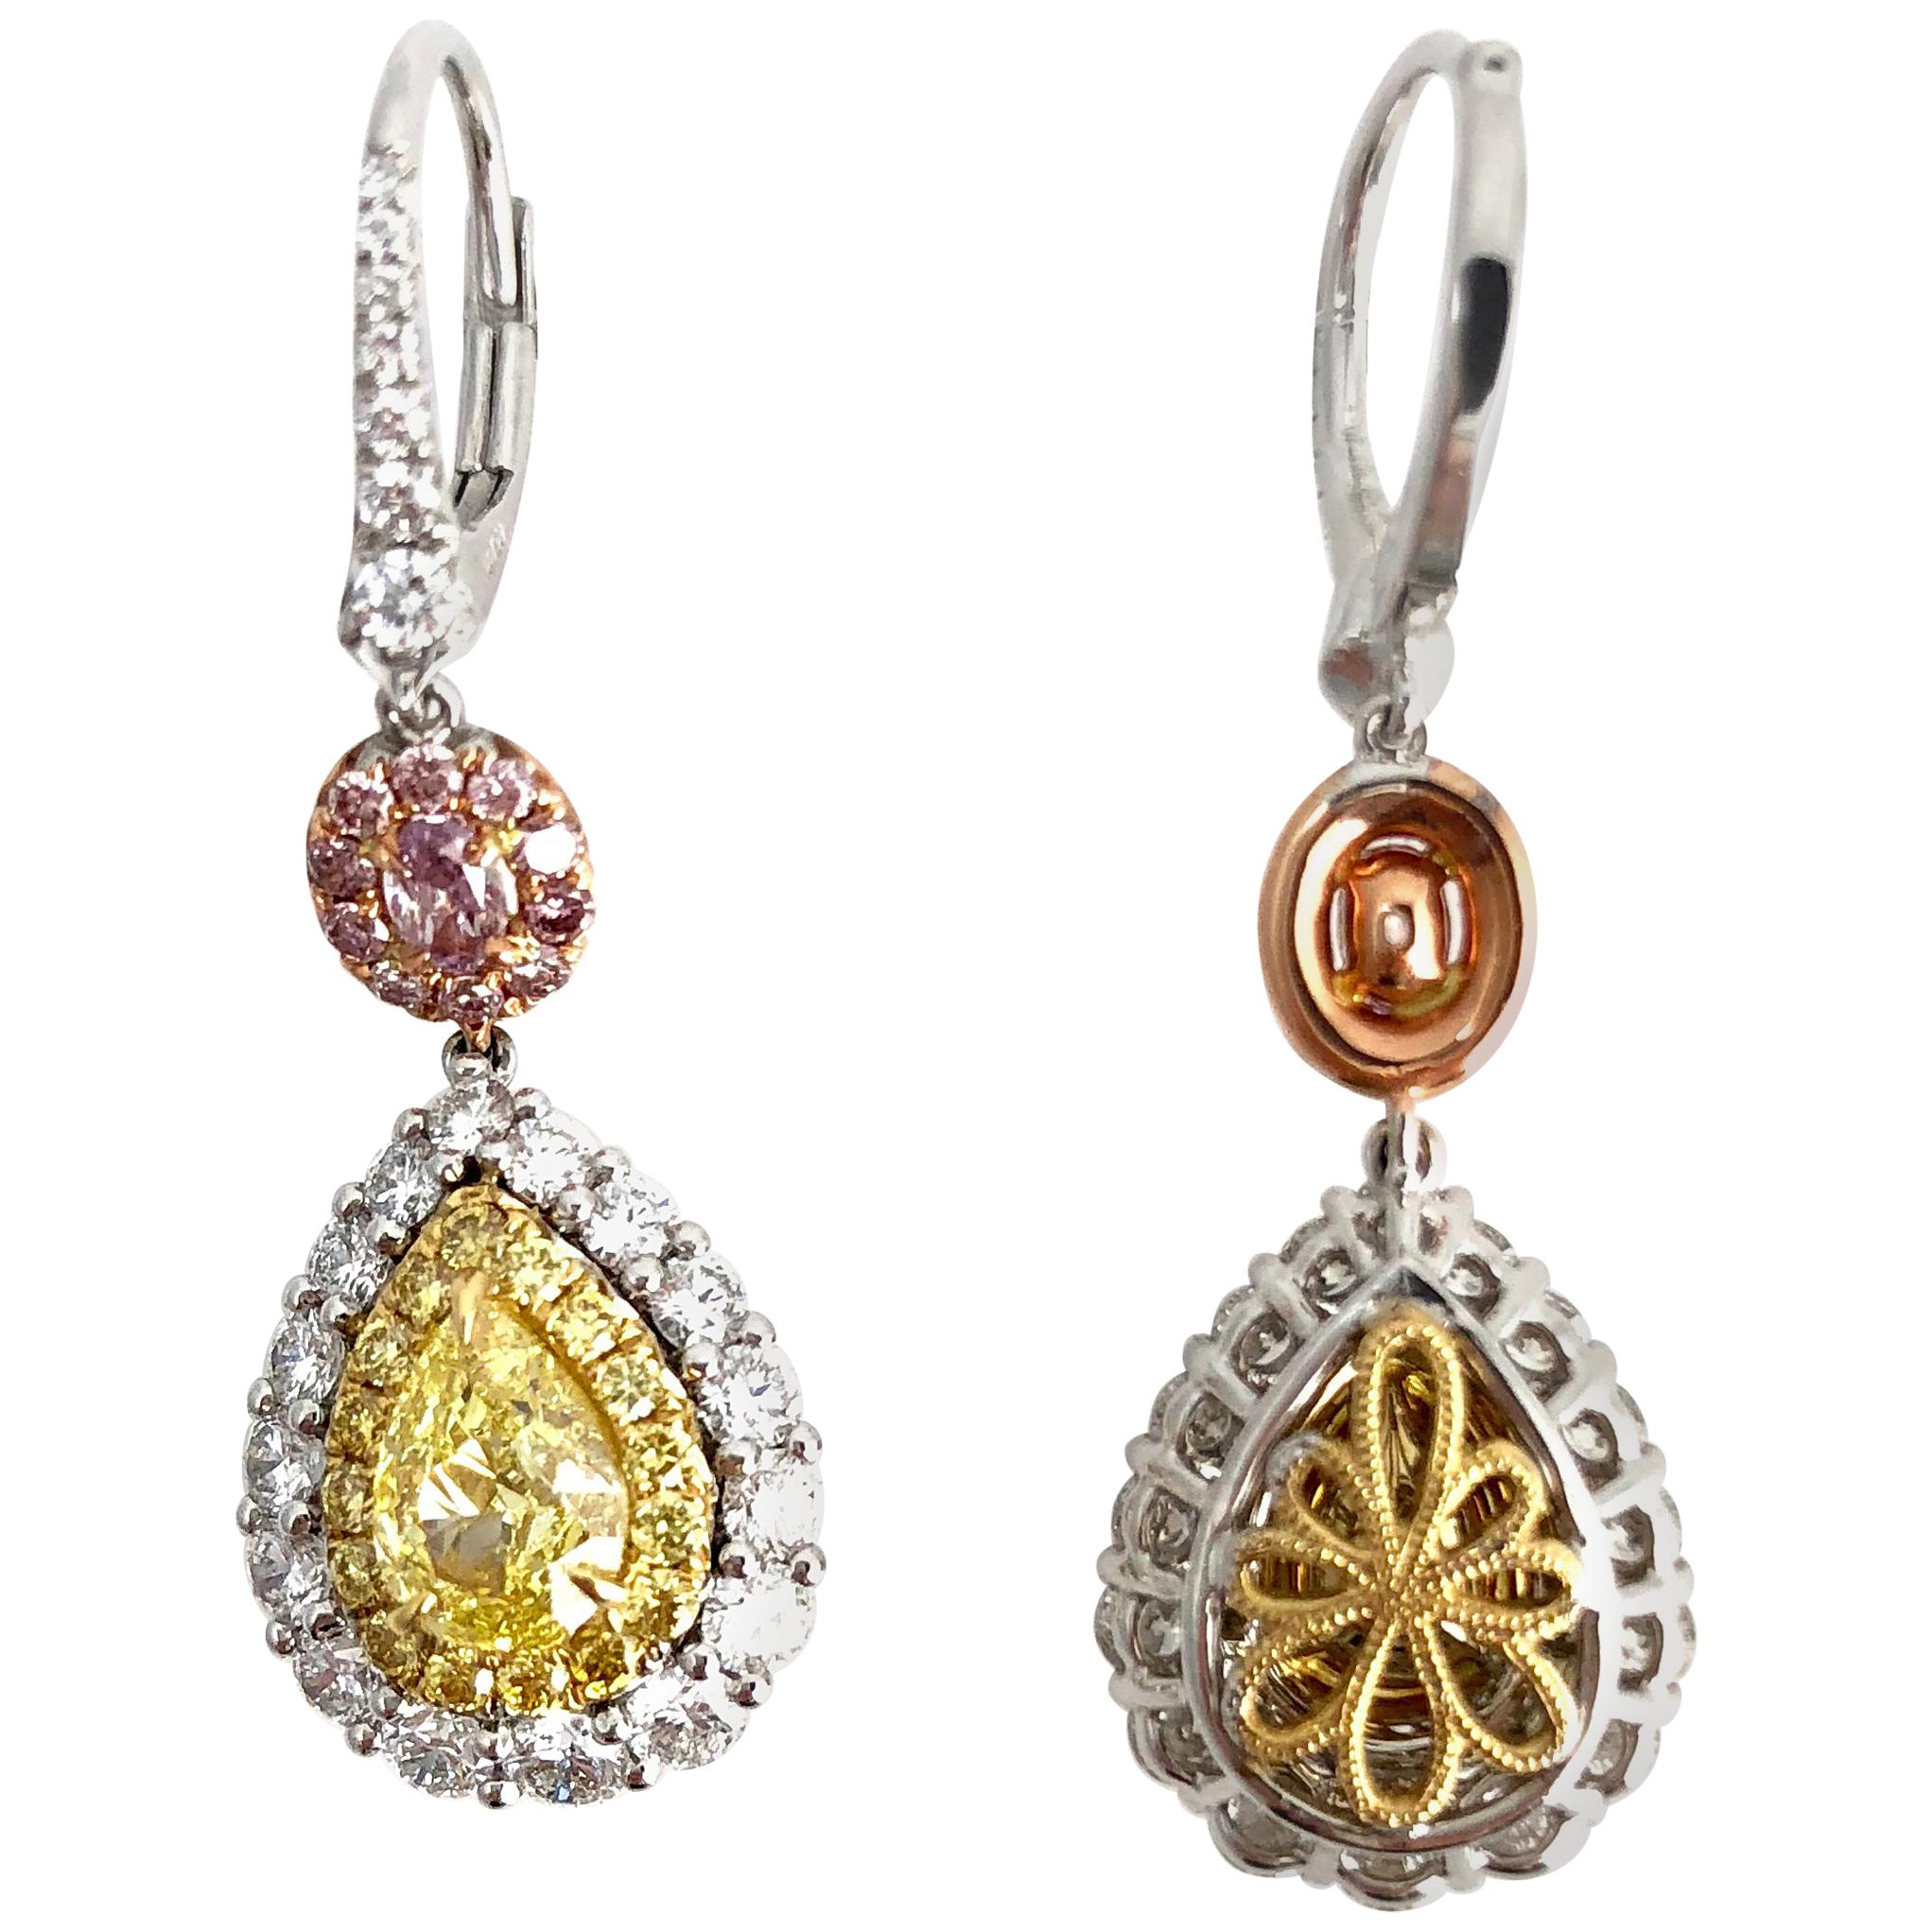 DiamondTown GIA Certified Natural Fancy Yellow and Pink Diamonds Earrings